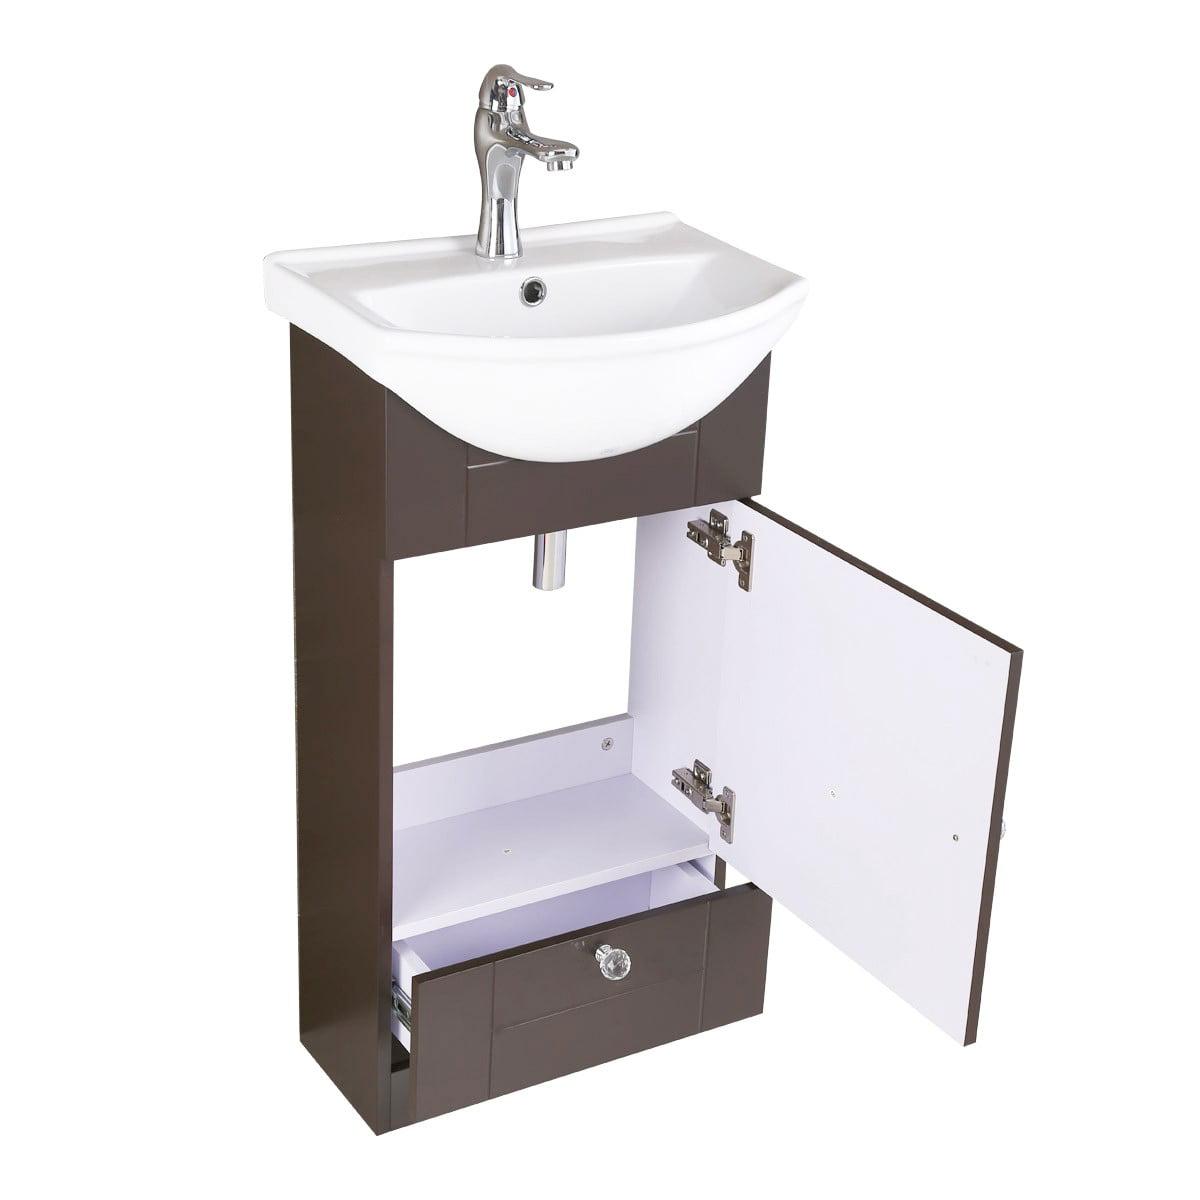 Renovator S Supply Dark Brown Bathroom Vanity Cabinet With White Sink Walmart Com Walmart Com